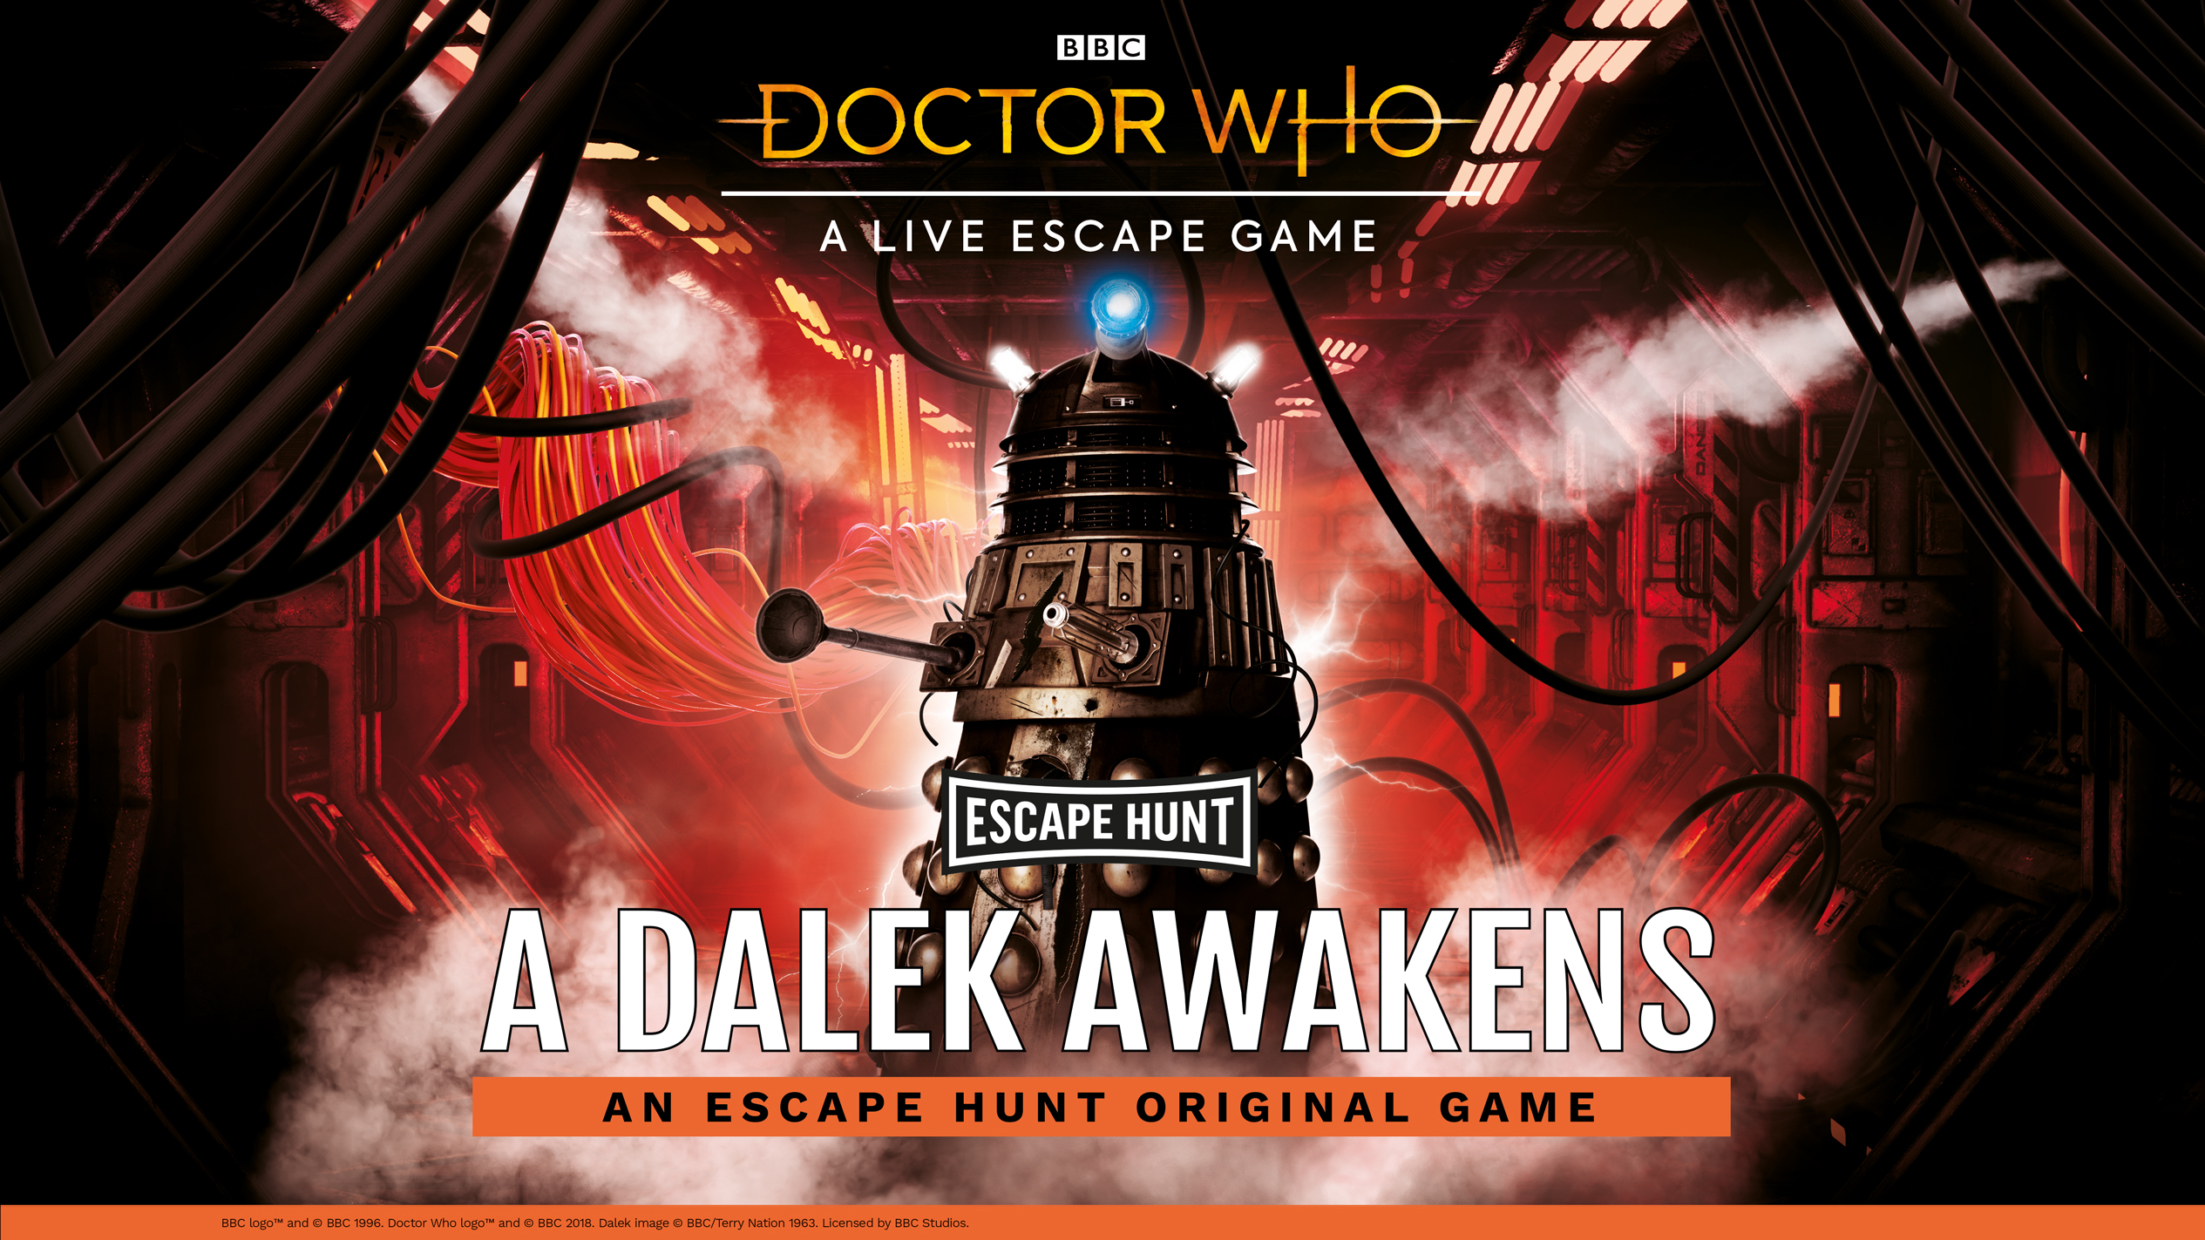 Doctor Who: A Dalek Awakens